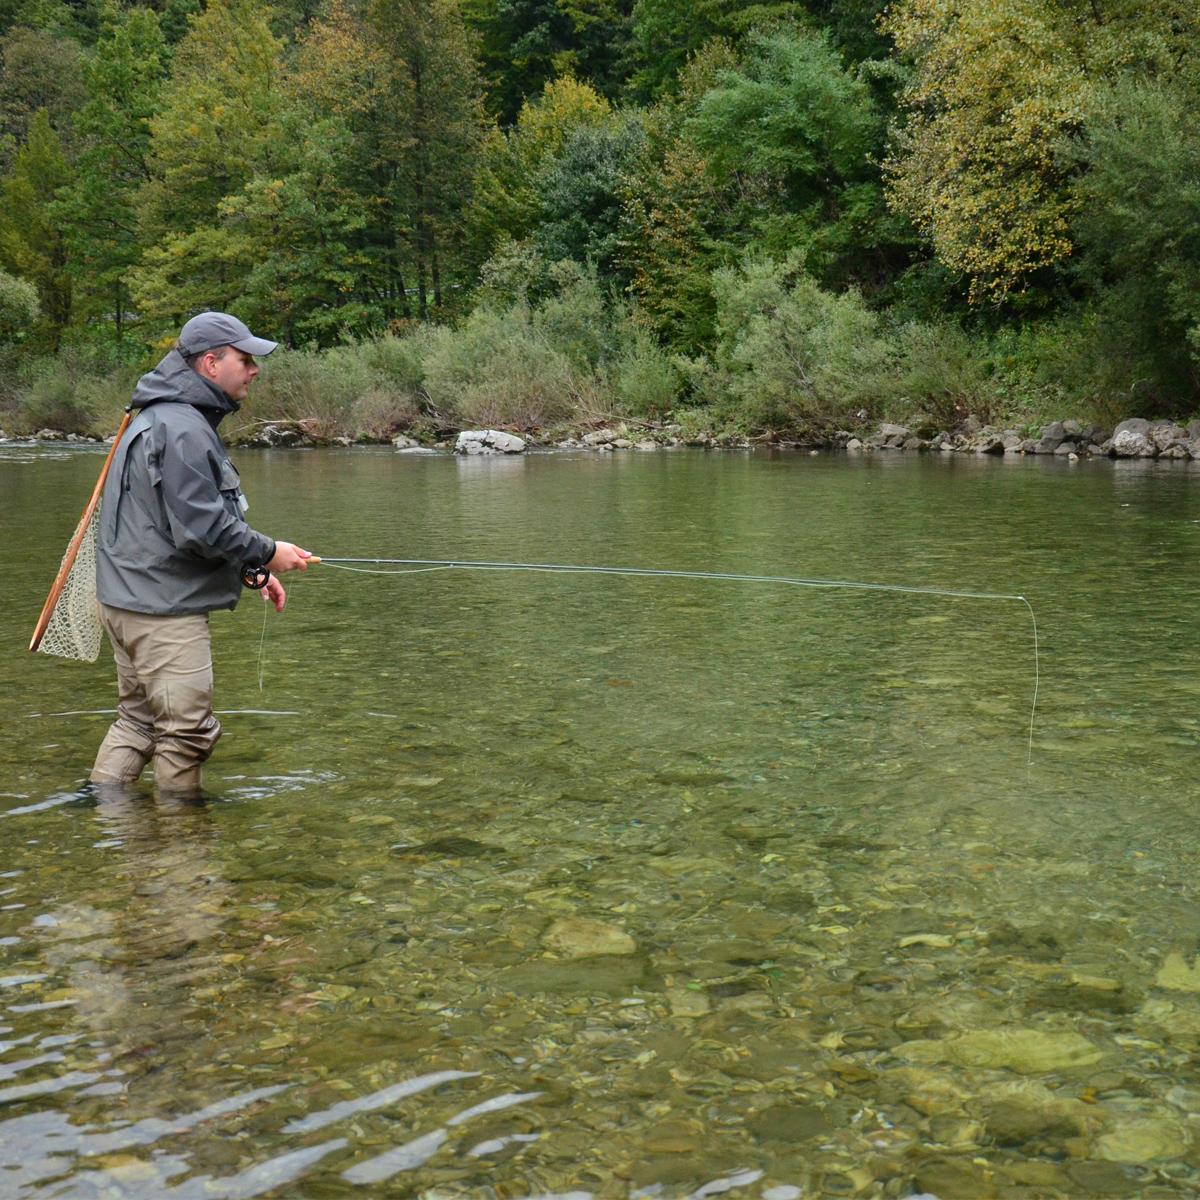 Fliegenfischen am Fluss in Slowenien